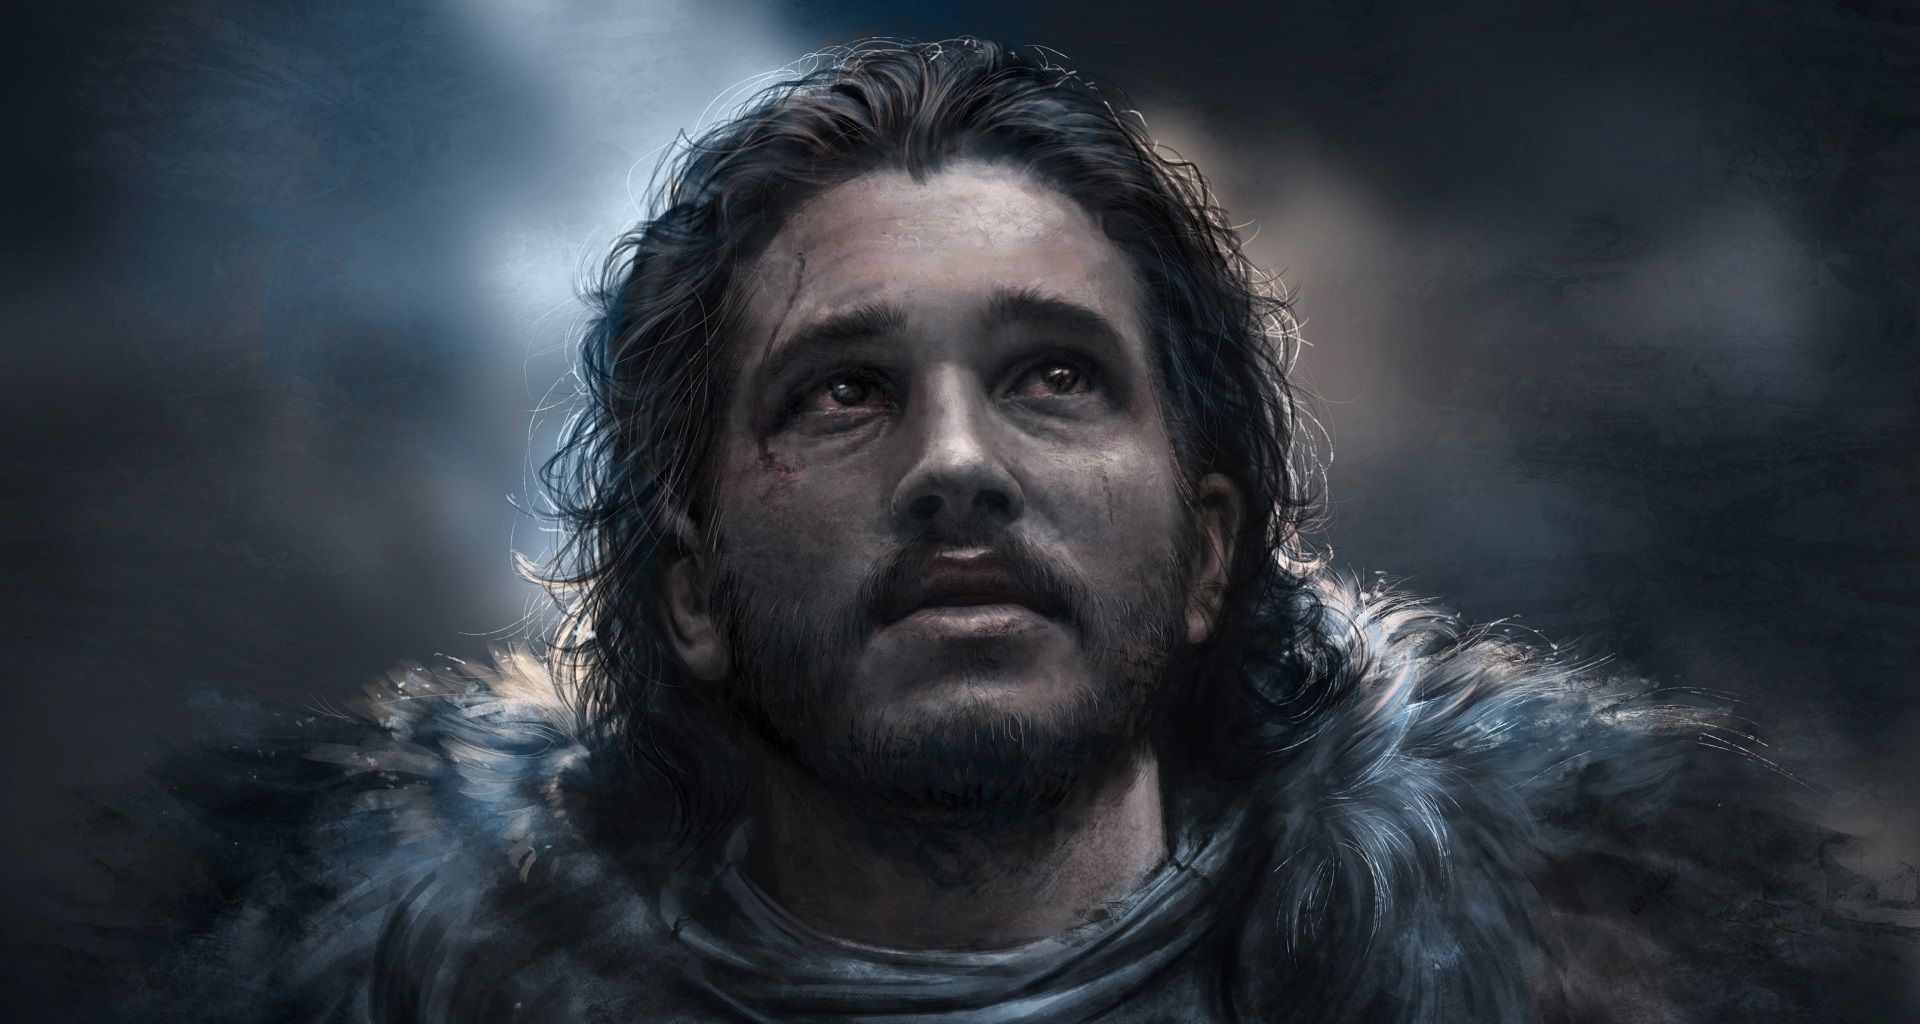 1920x1024 Jon Snow Hd Best Wallpaper For Desktop Jon Snow Art Jon Snow Portrait